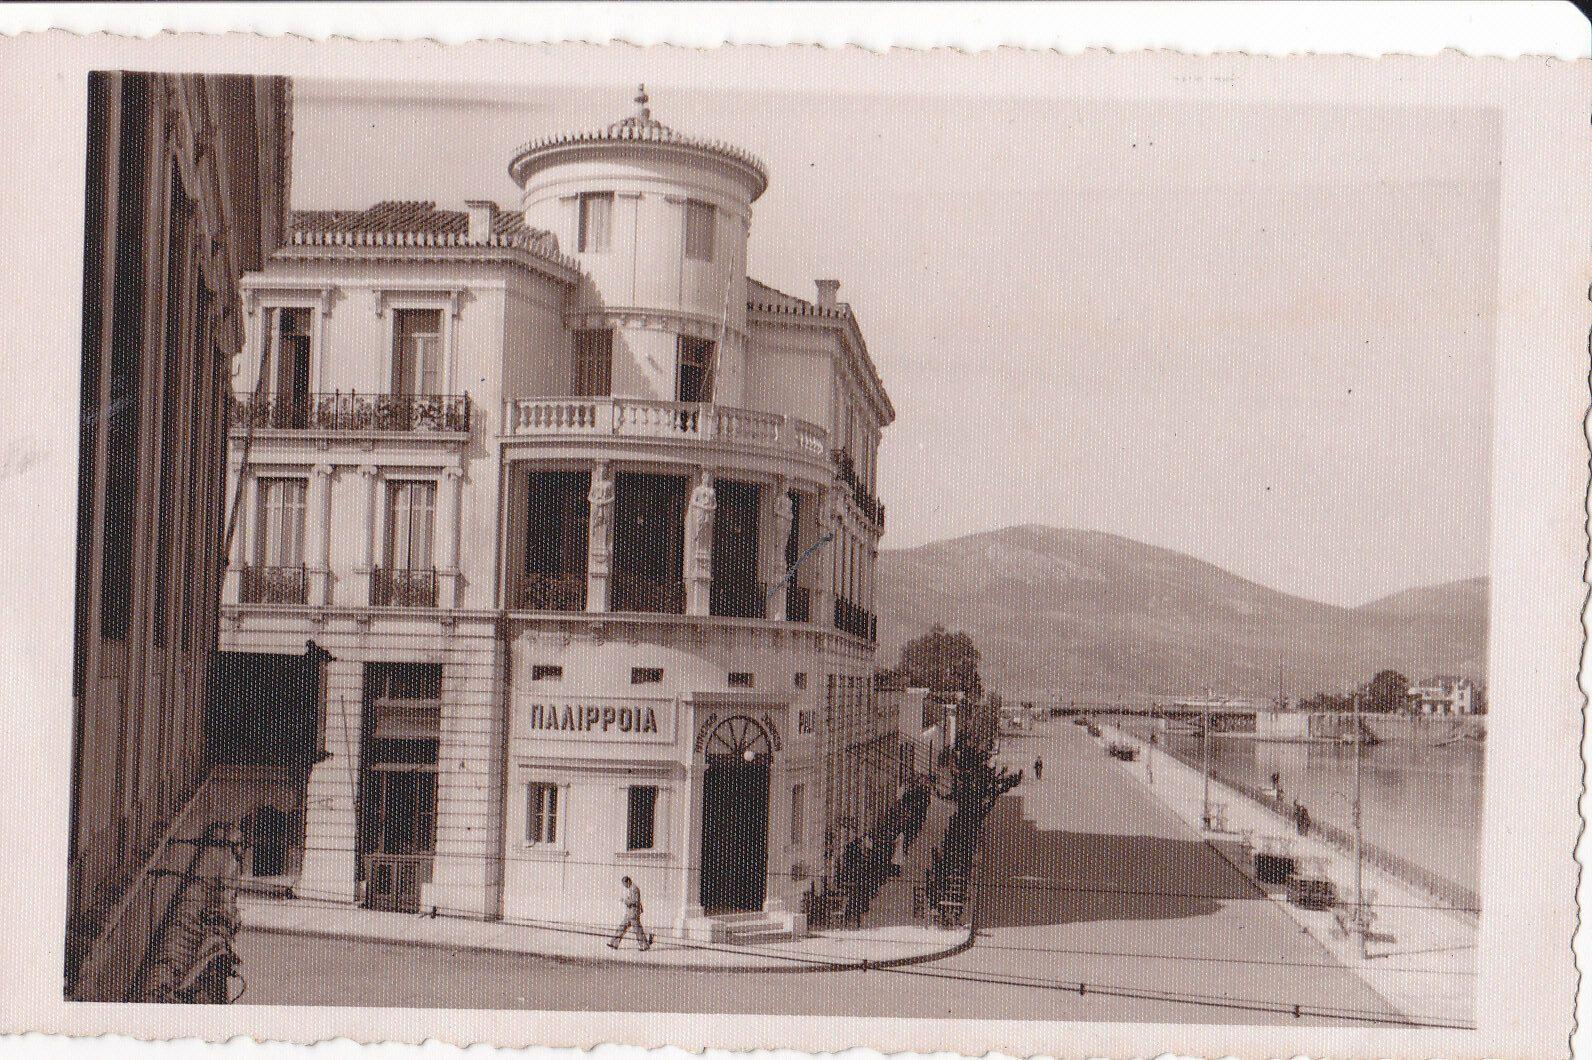 Greece chalkida hotel palirroia ebay greece